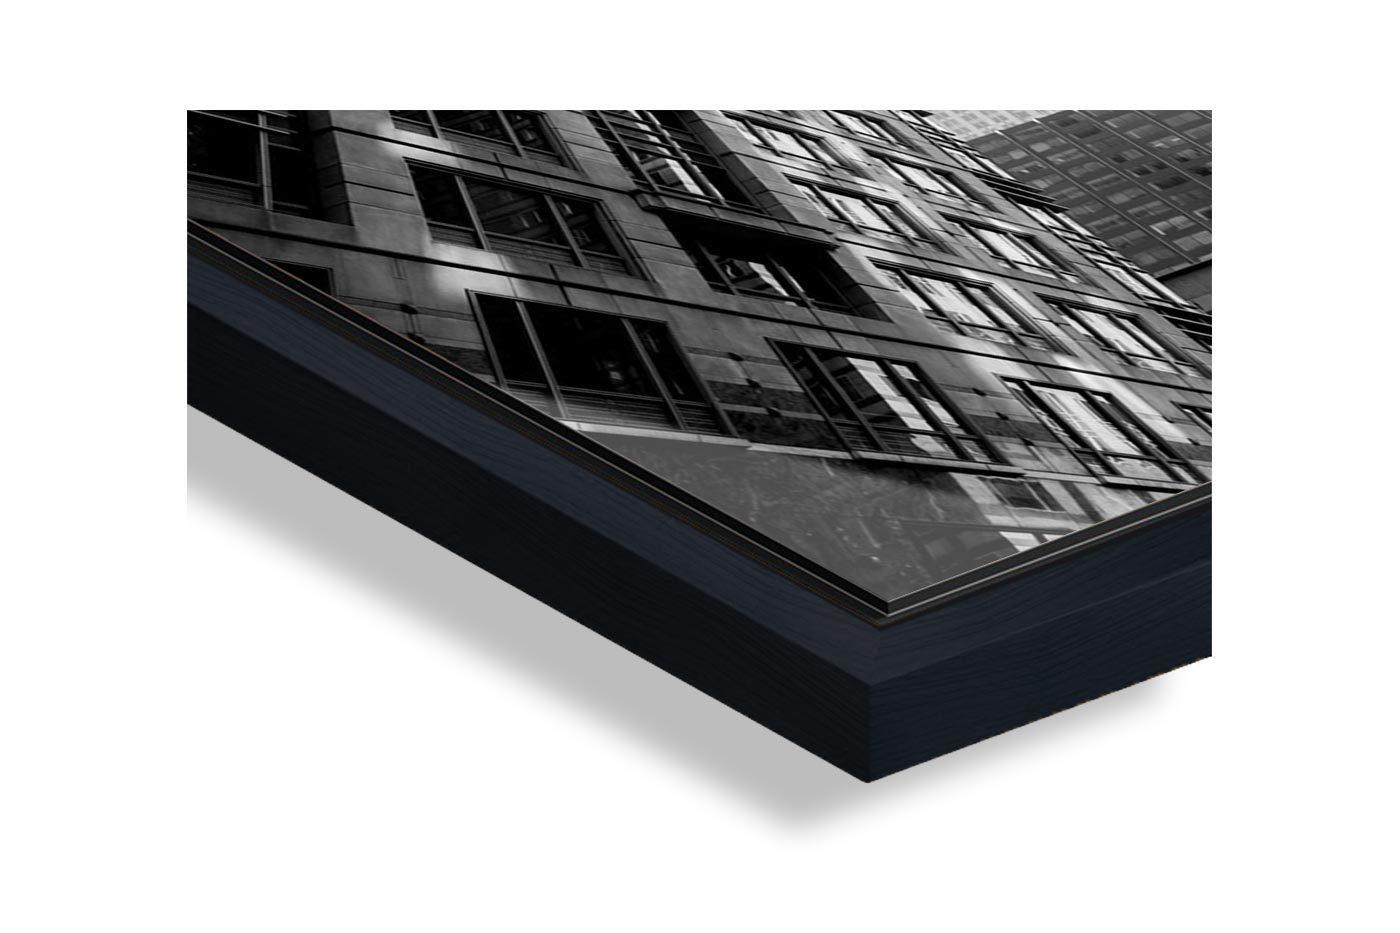 Profil caisse americaine Buildings Chicago